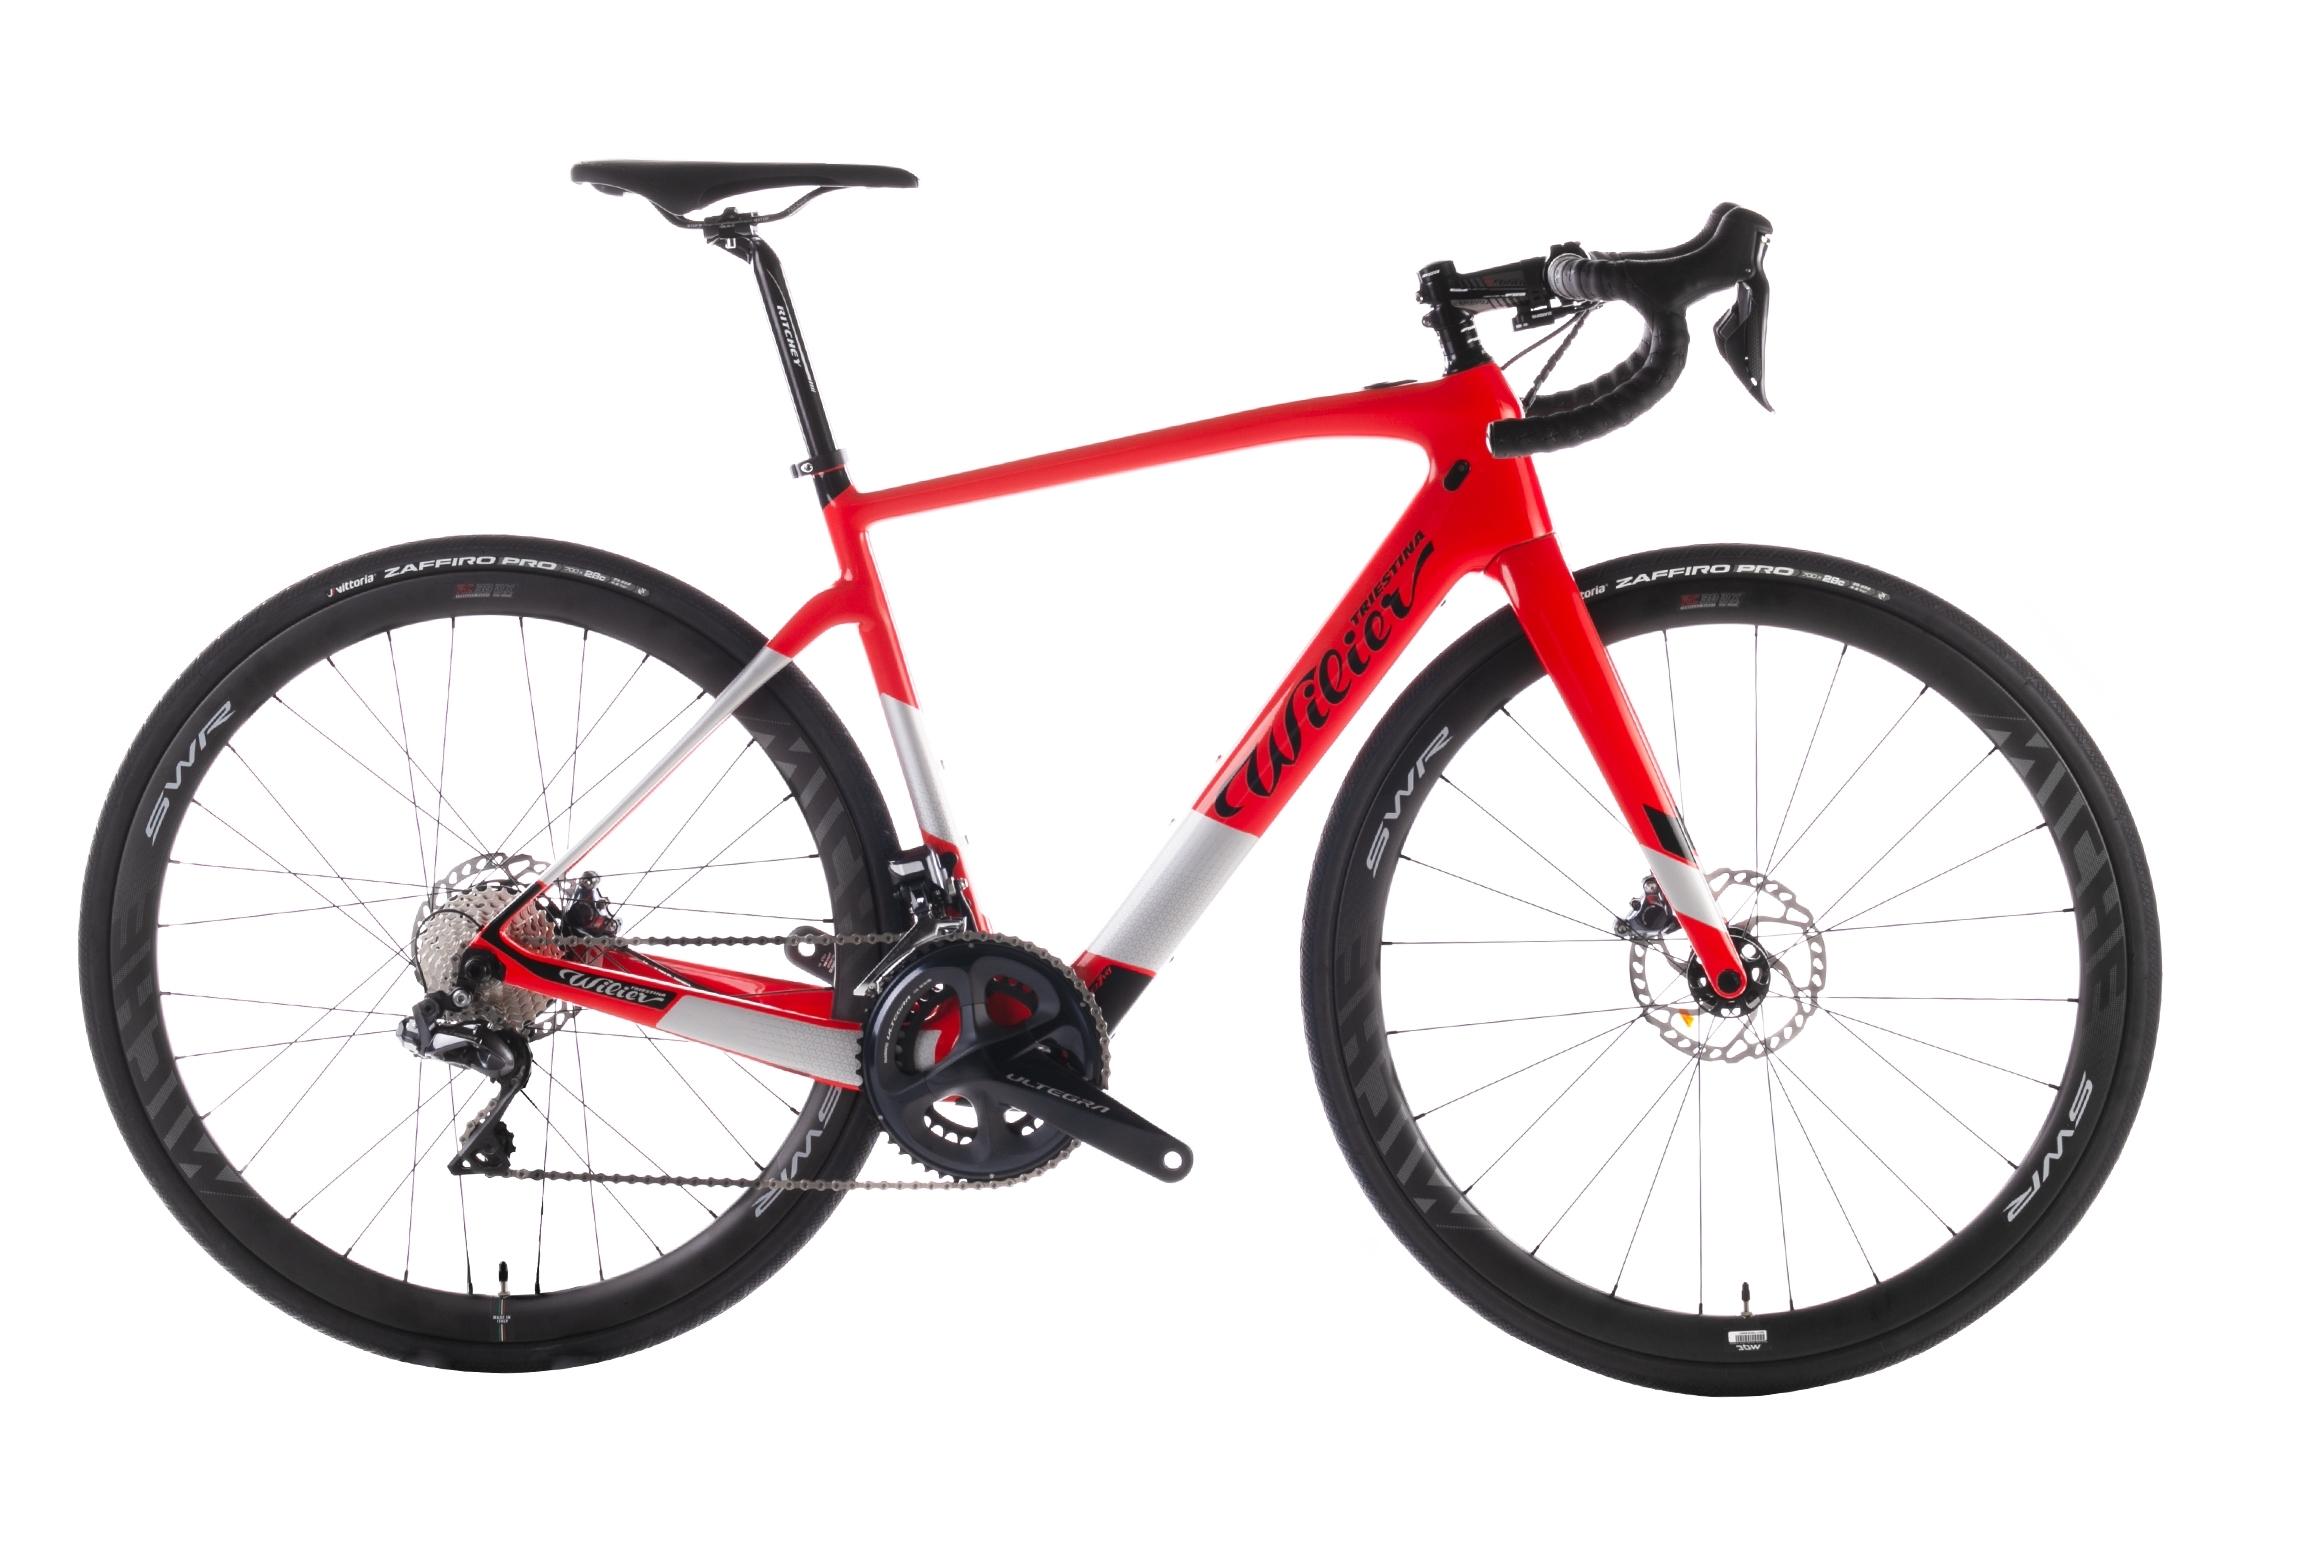 kolo CENTO1HY+ULTEGRA Di2 8070+REVOX red glossy  L